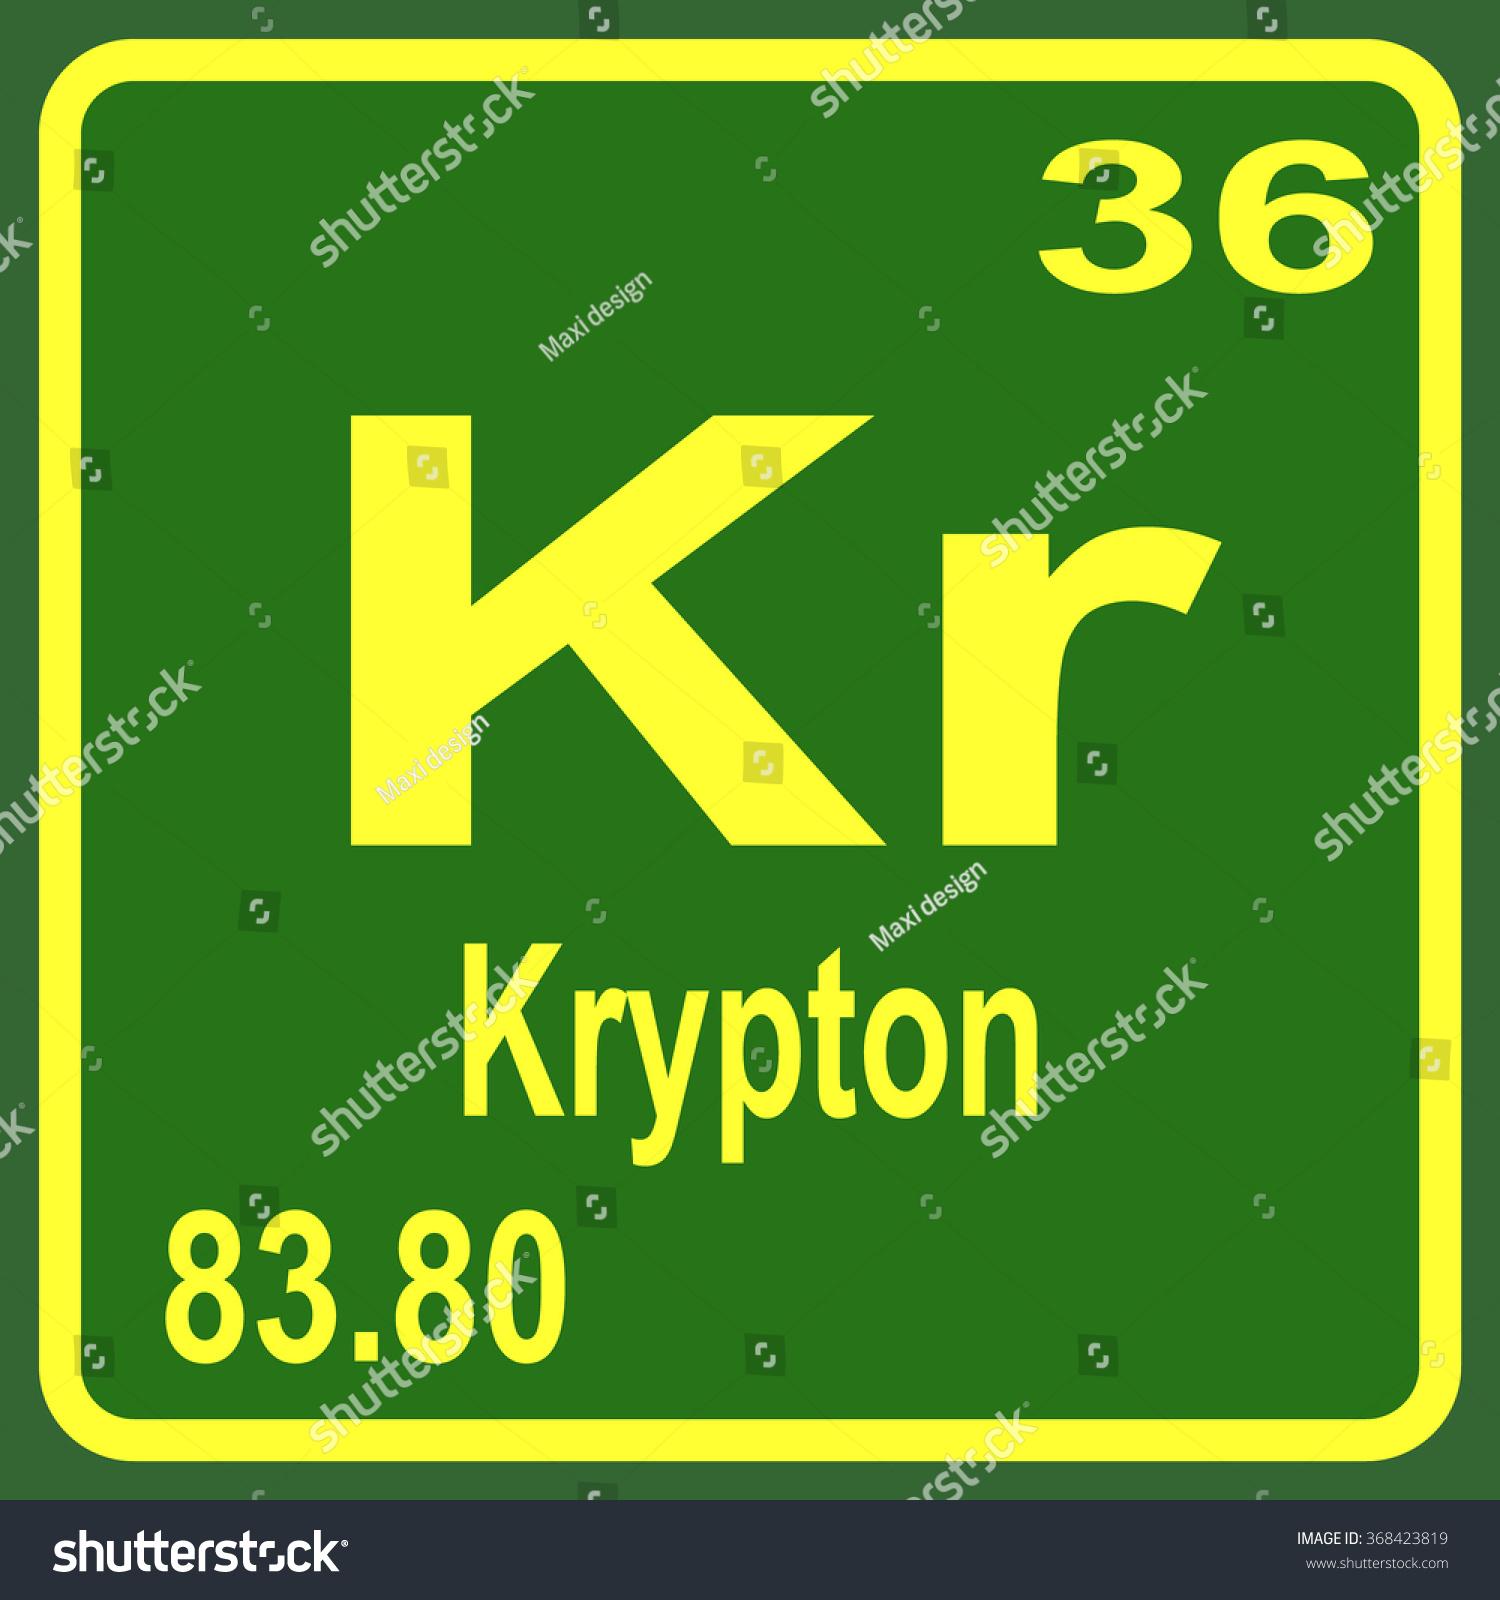 Krypton symbol periodic table image hvac symbol ez go wire diagram periodic table elements krypton stock vector 368423819 shutterstock stock vector periodic table of elements krypton 368423819 gamestrikefo Images